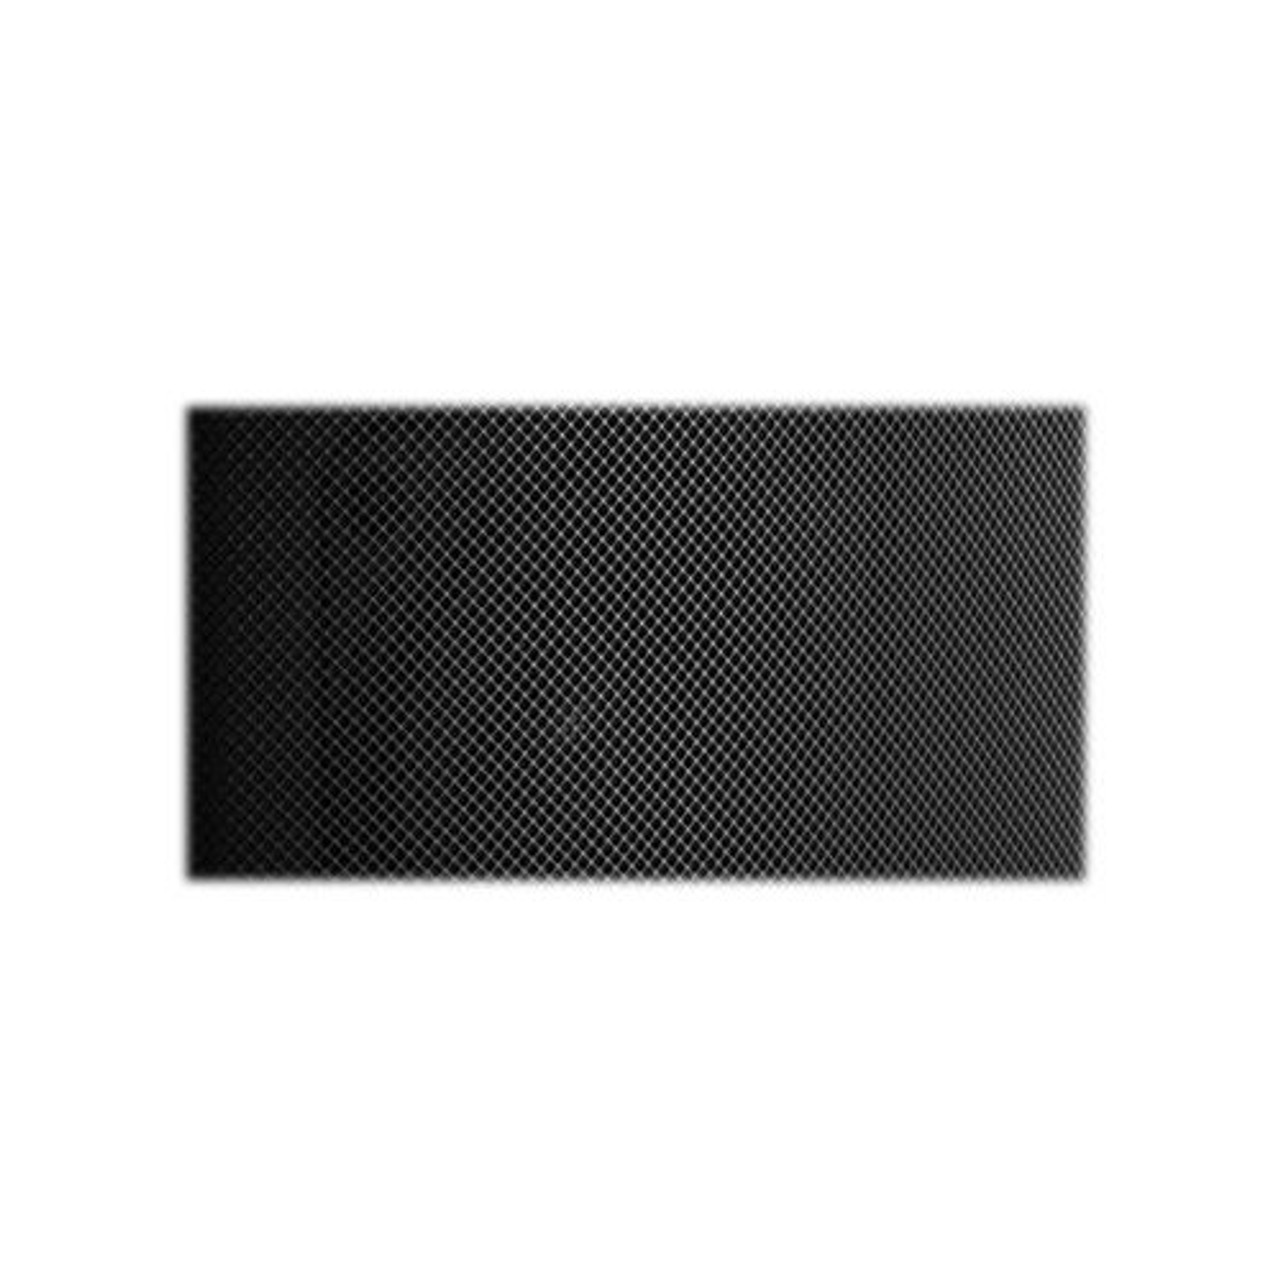 Soundcast VG3 Waterproof Portable Bluetooth Speaker